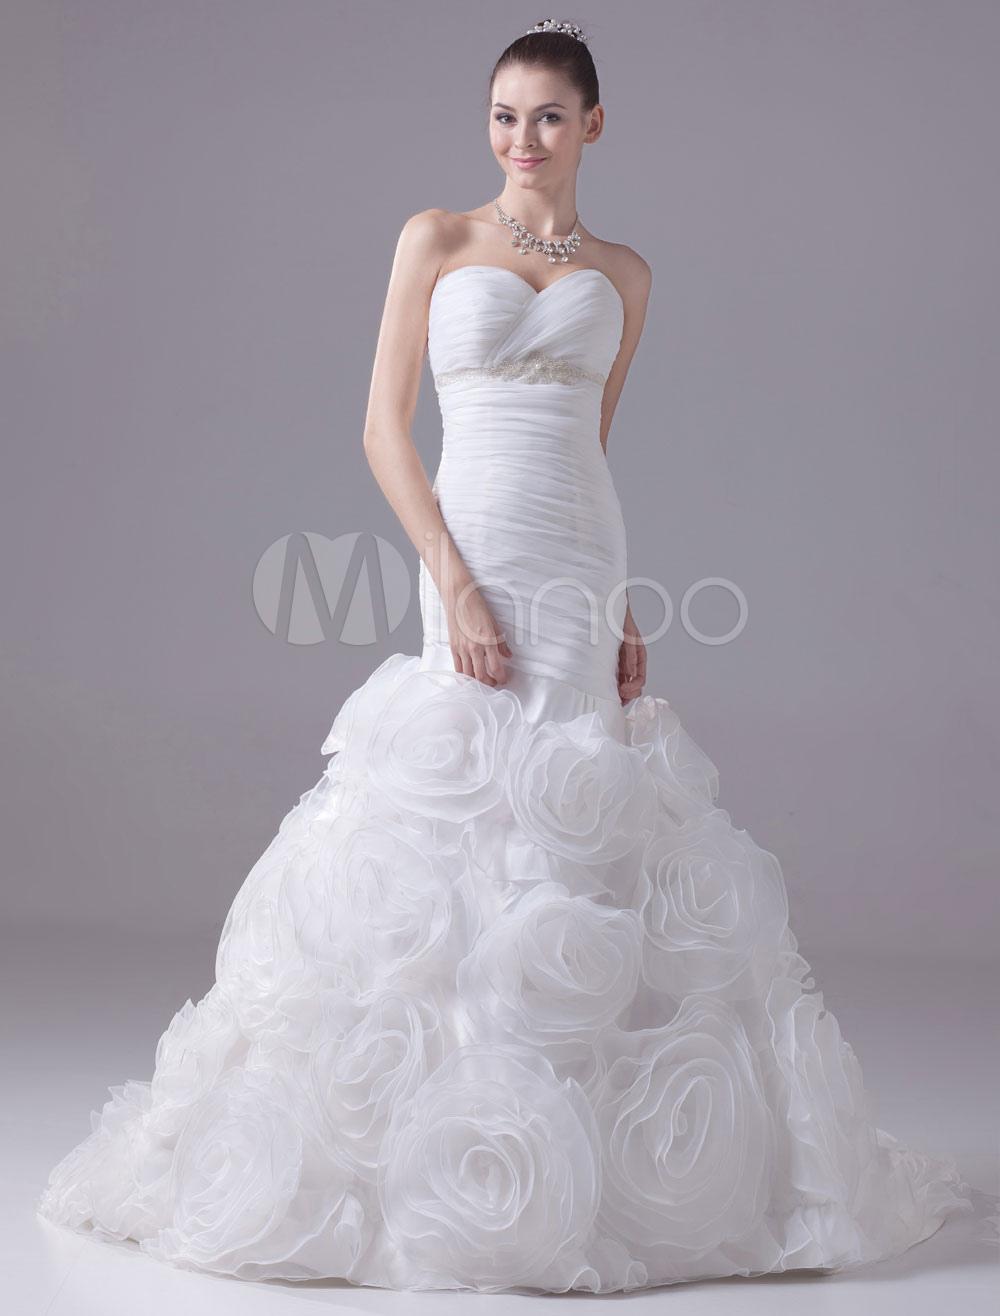 Mermaid Wedding Dress Sweatheart Pleated Beading Organza Flower Chaple Train Bridal Dress